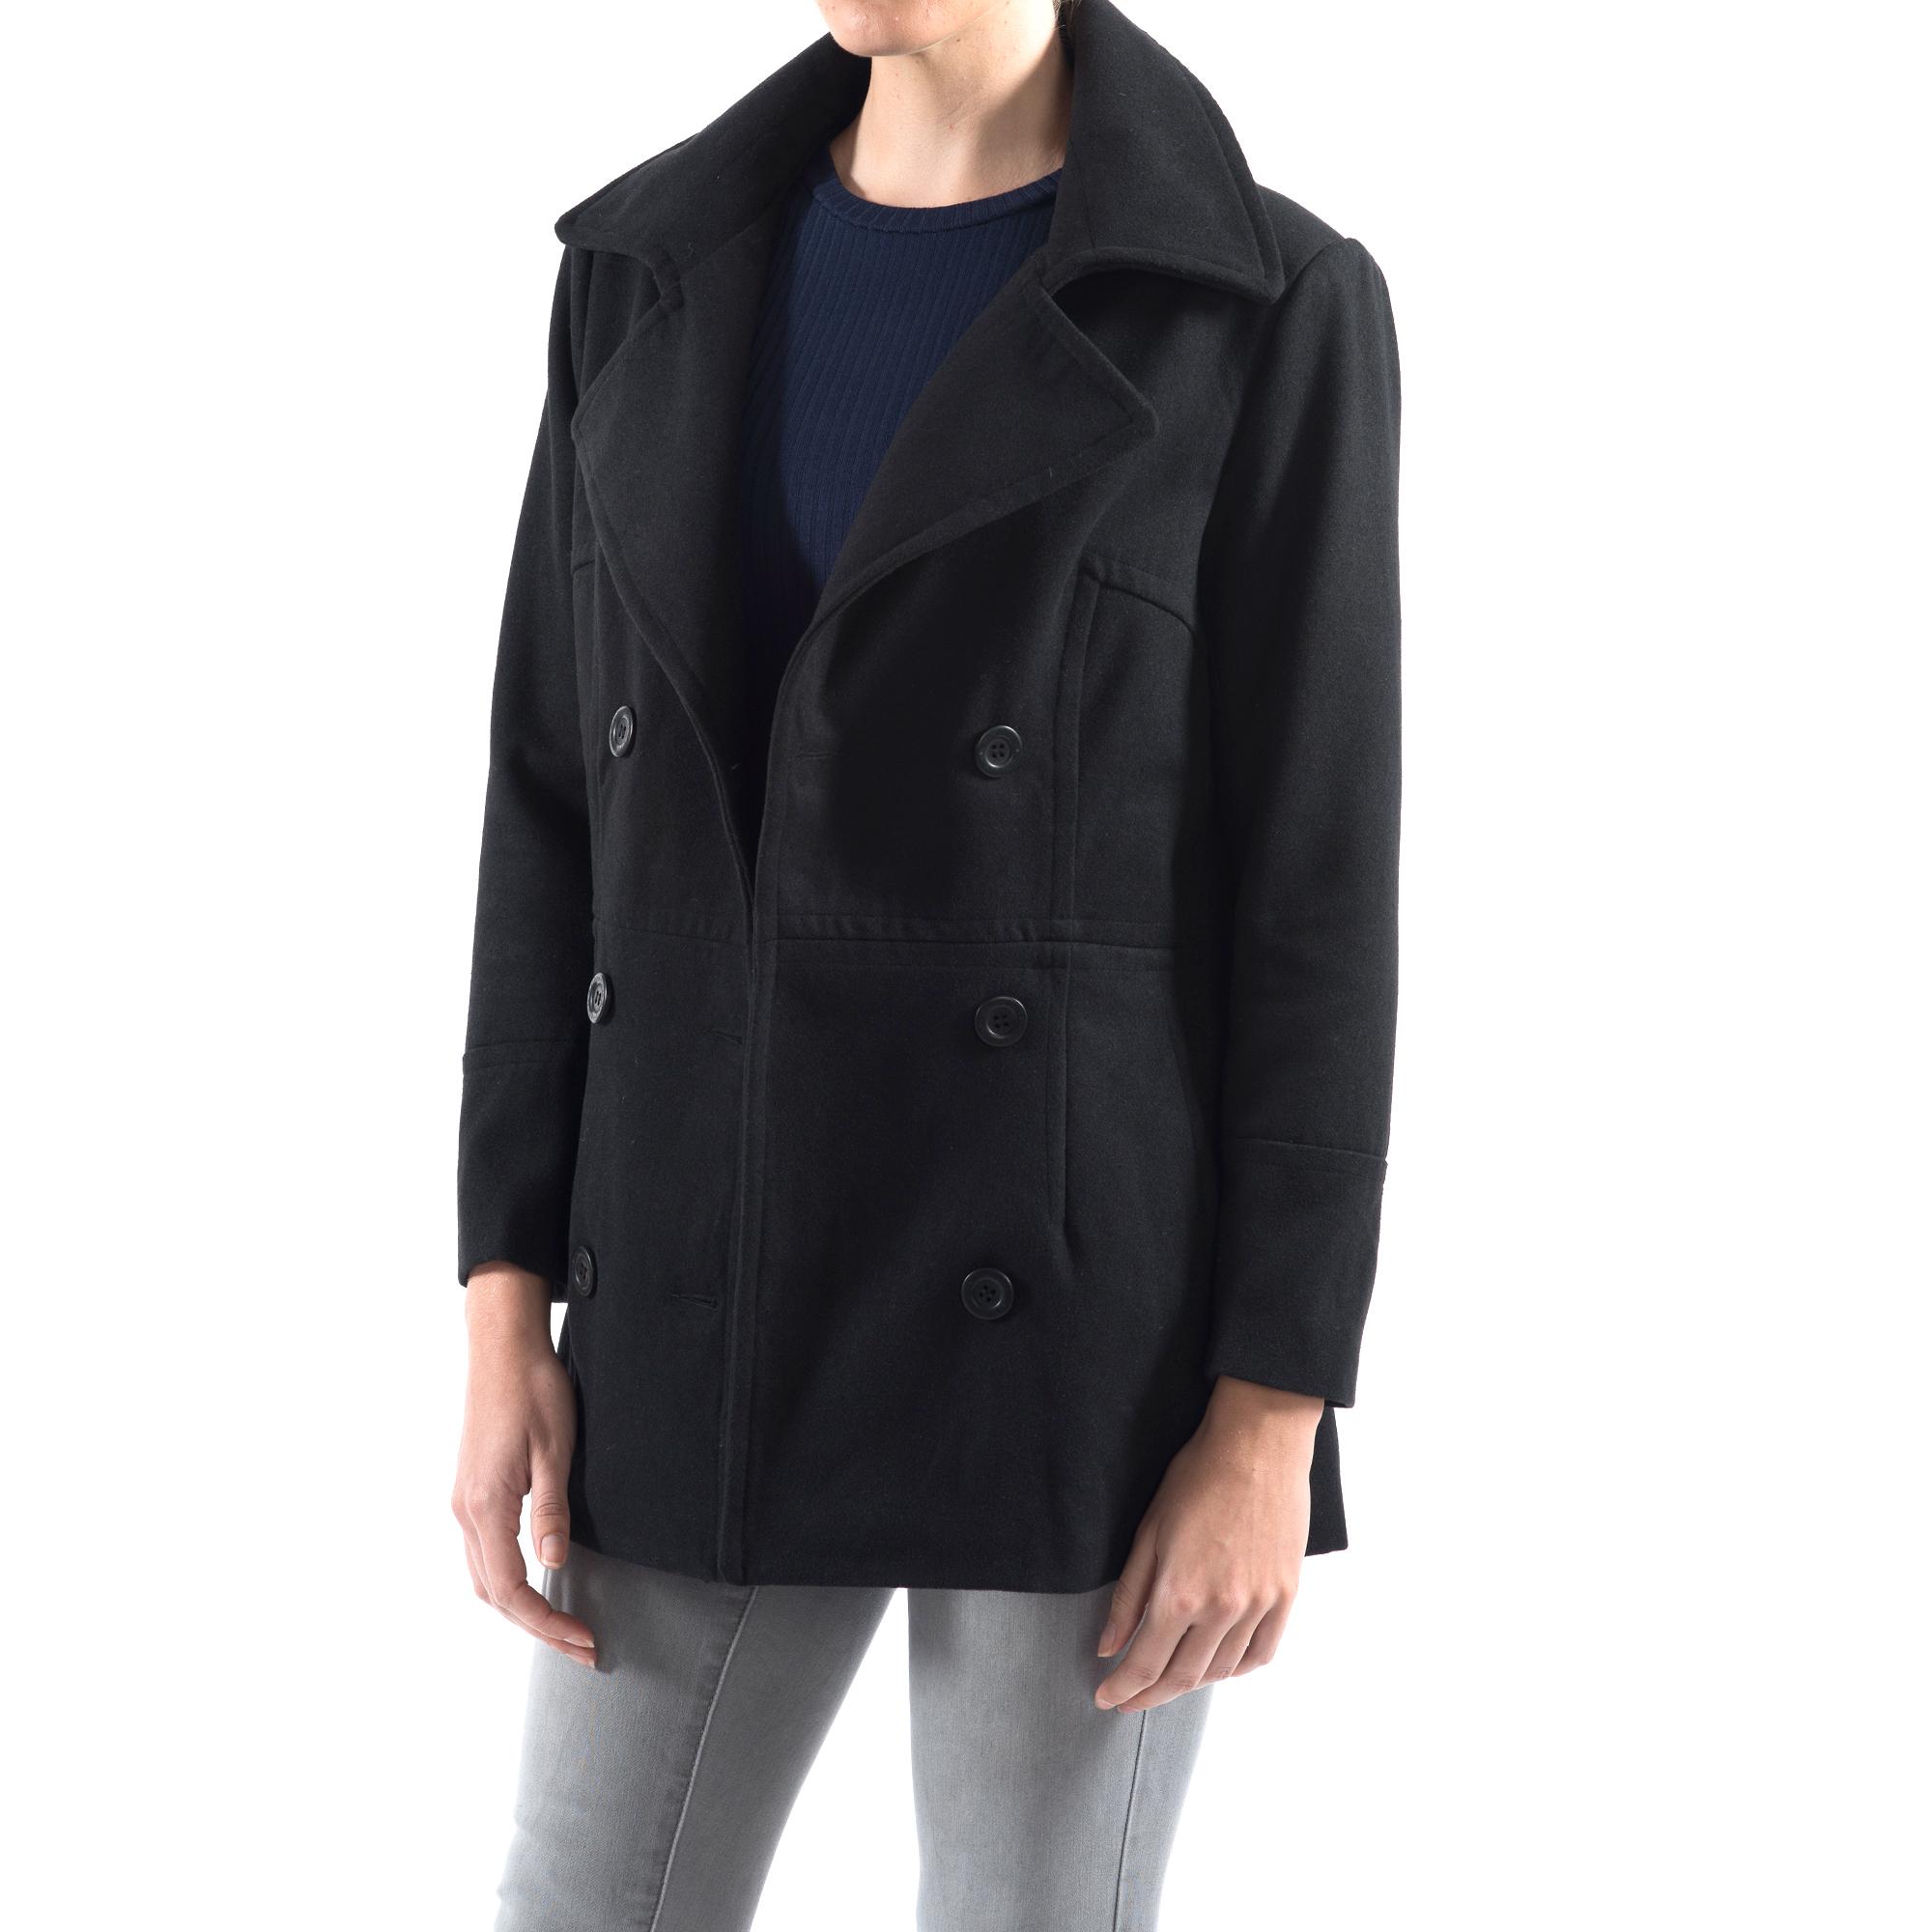 Alpine-Swiss-Emma-Womens-Peacoat-Jacket-Wool-Blazer-Double-Breasted-Overcoat-New thumbnail 18